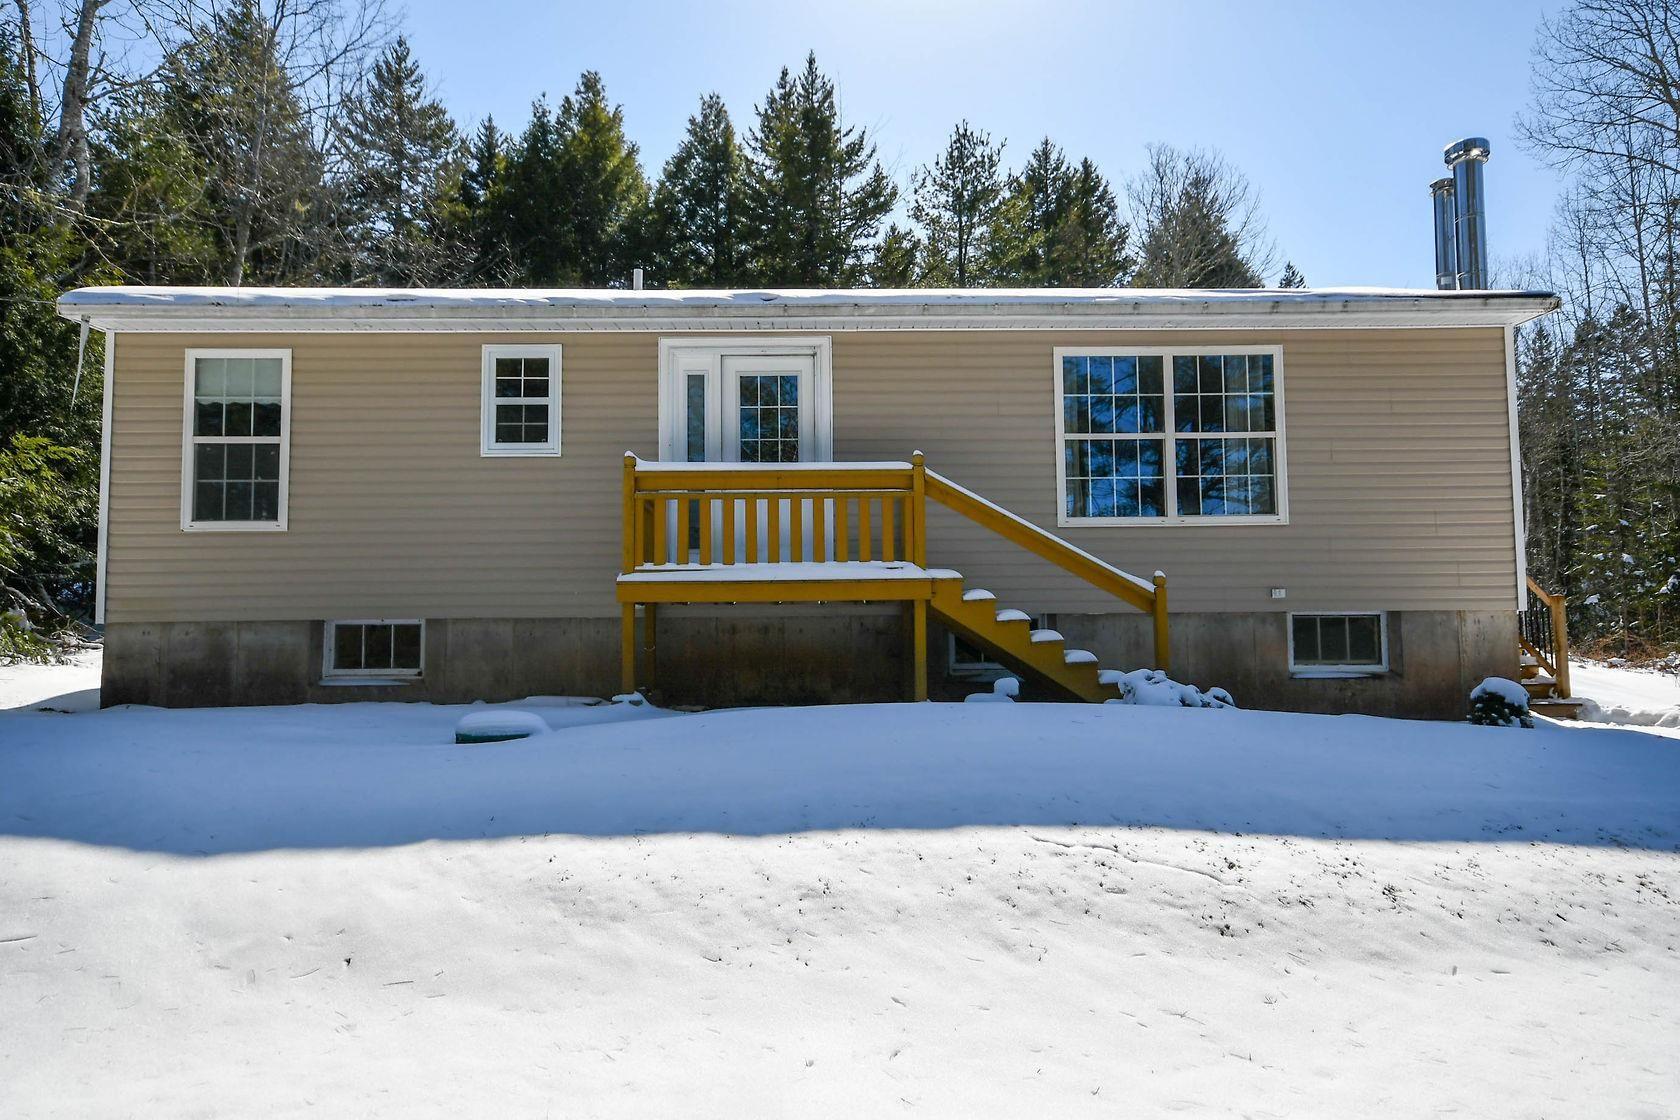 Main Photo: 267 Kinsac Road in Beaver Bank: 26-Beaverbank, Upper Sackville Residential for sale (Halifax-Dartmouth)  : MLS®# 202105578